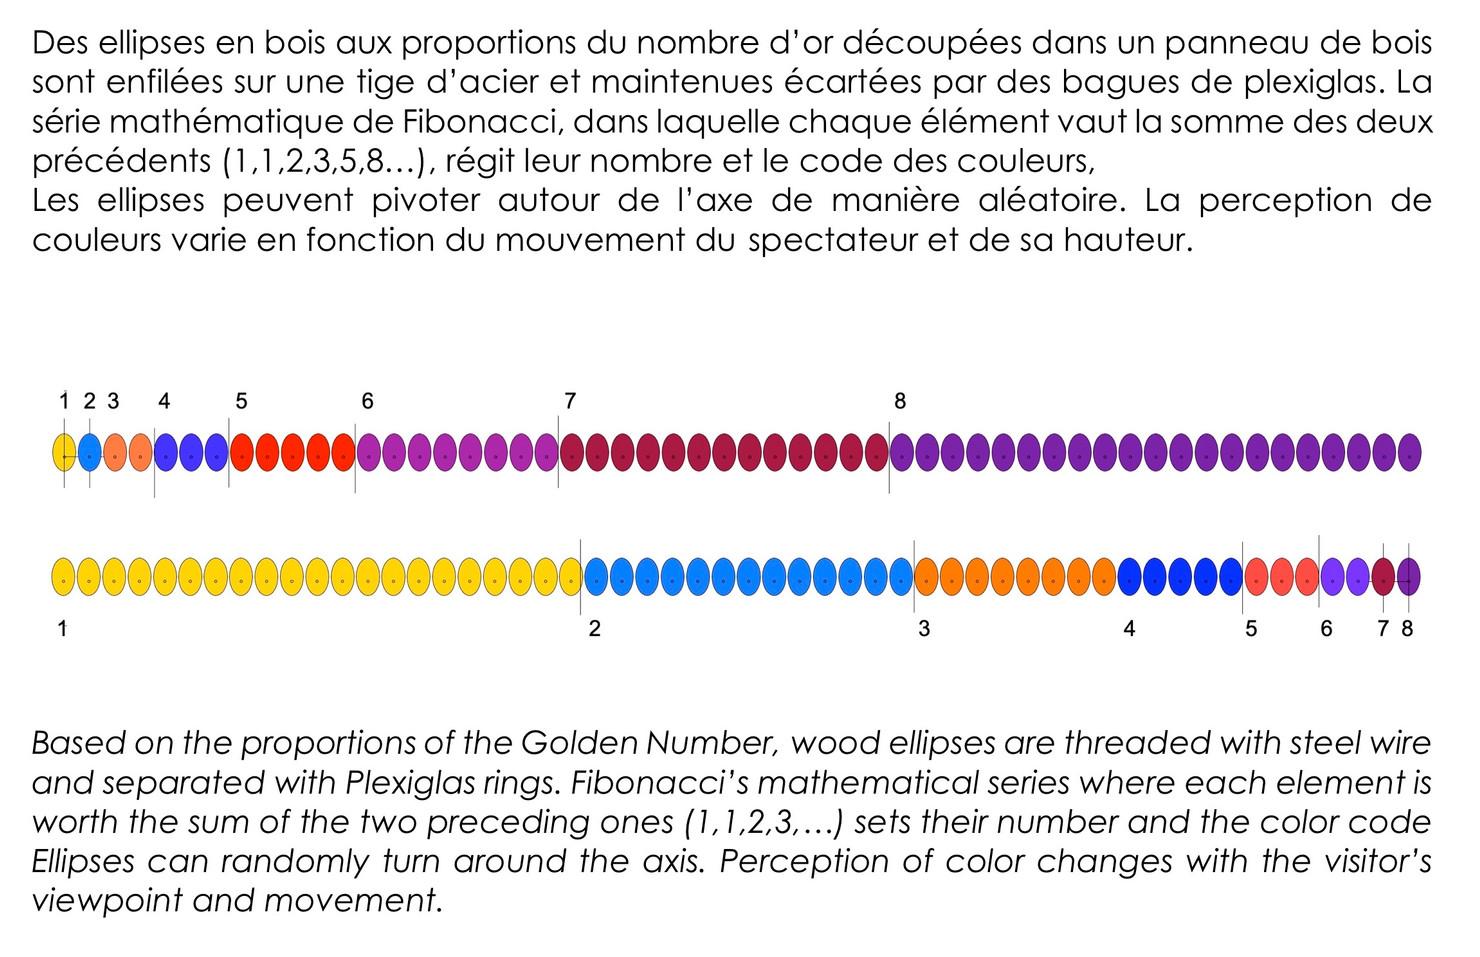 54 Golden Ellipses YBO, 2015